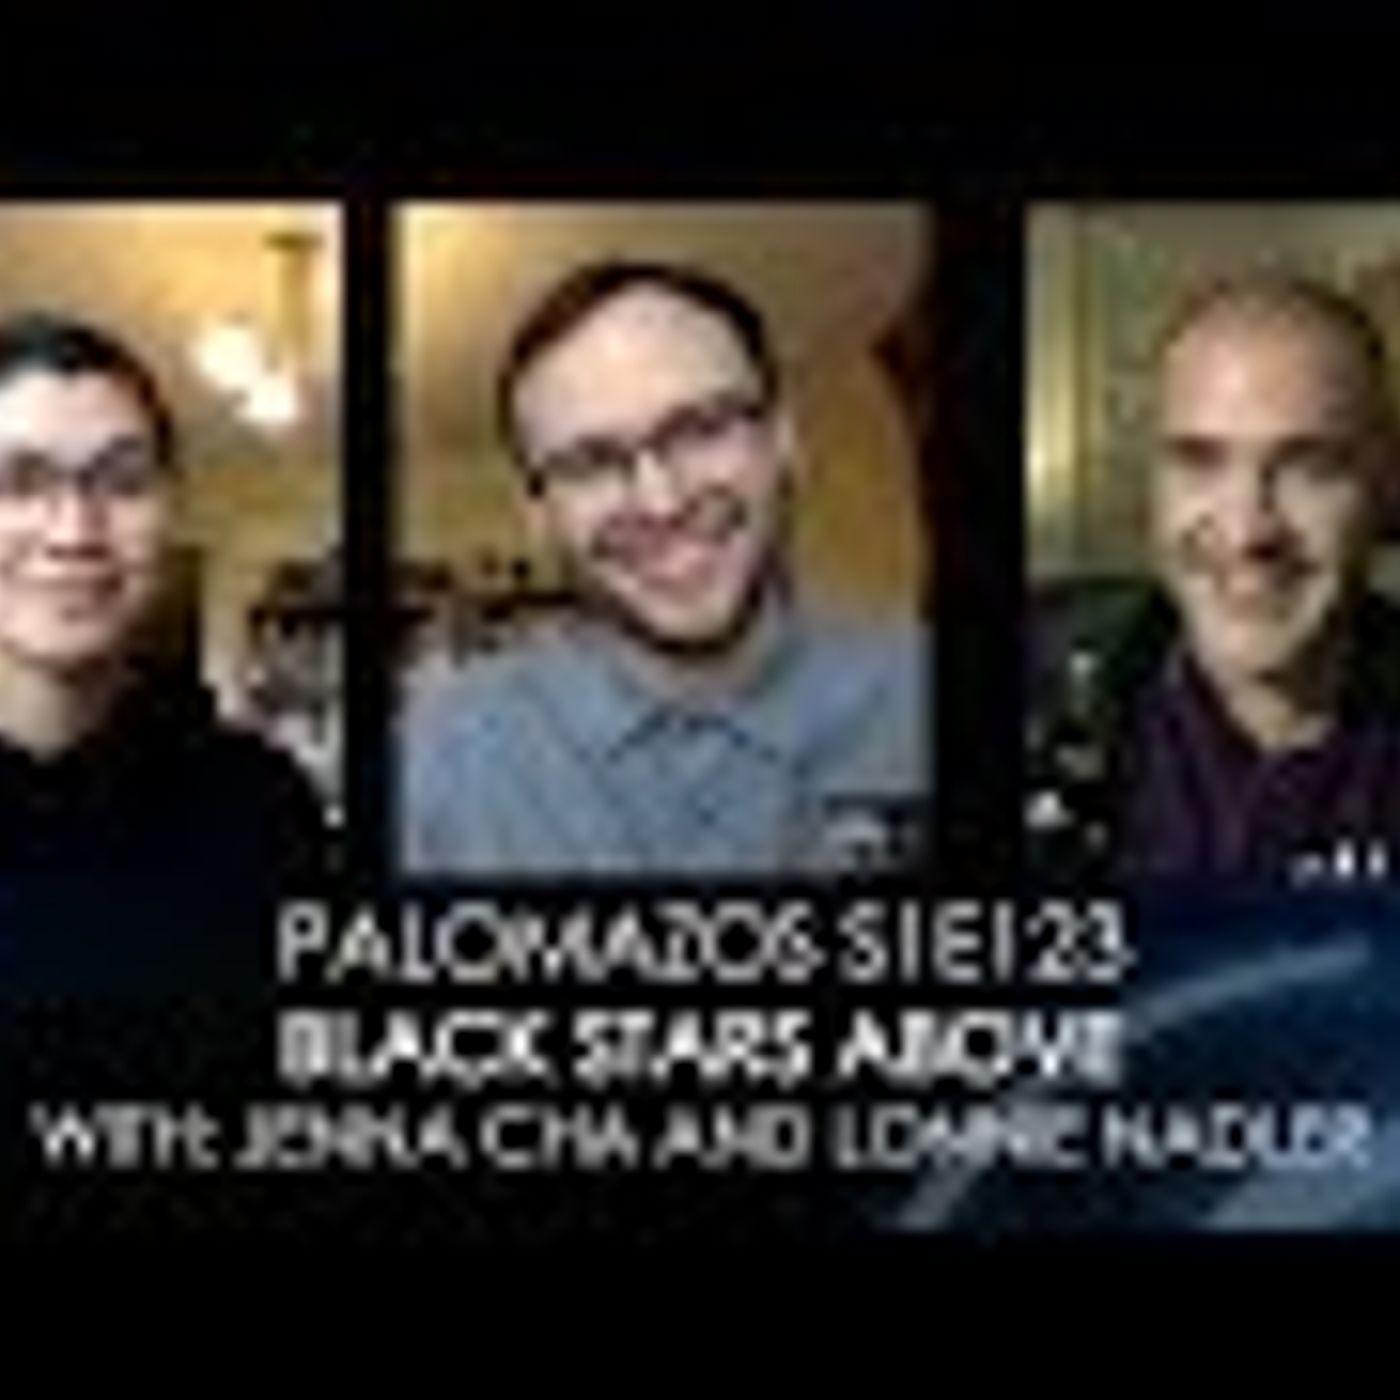 Palomazos S1E123 - Black Stars Above (With Jenna Cha and Lonnie Nadler)